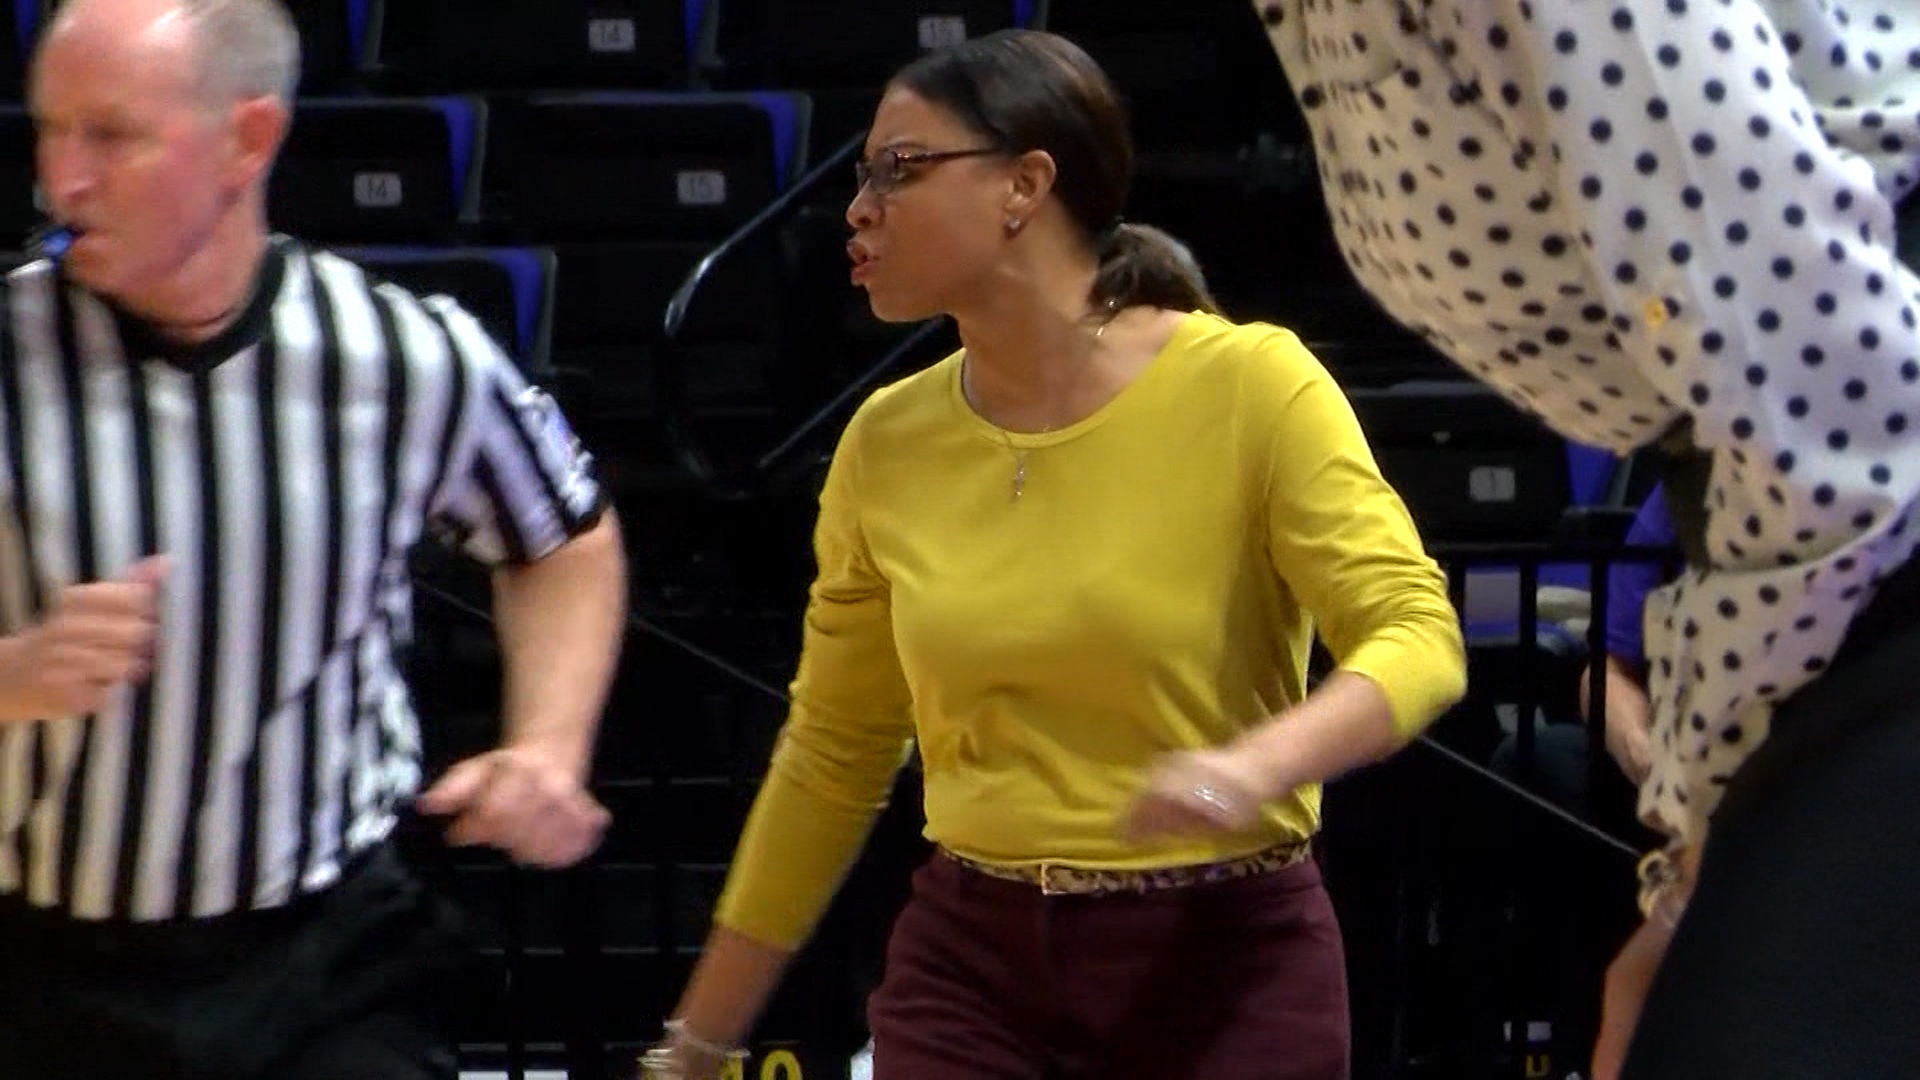 LSU WBB Head Coach Nikki Fargas